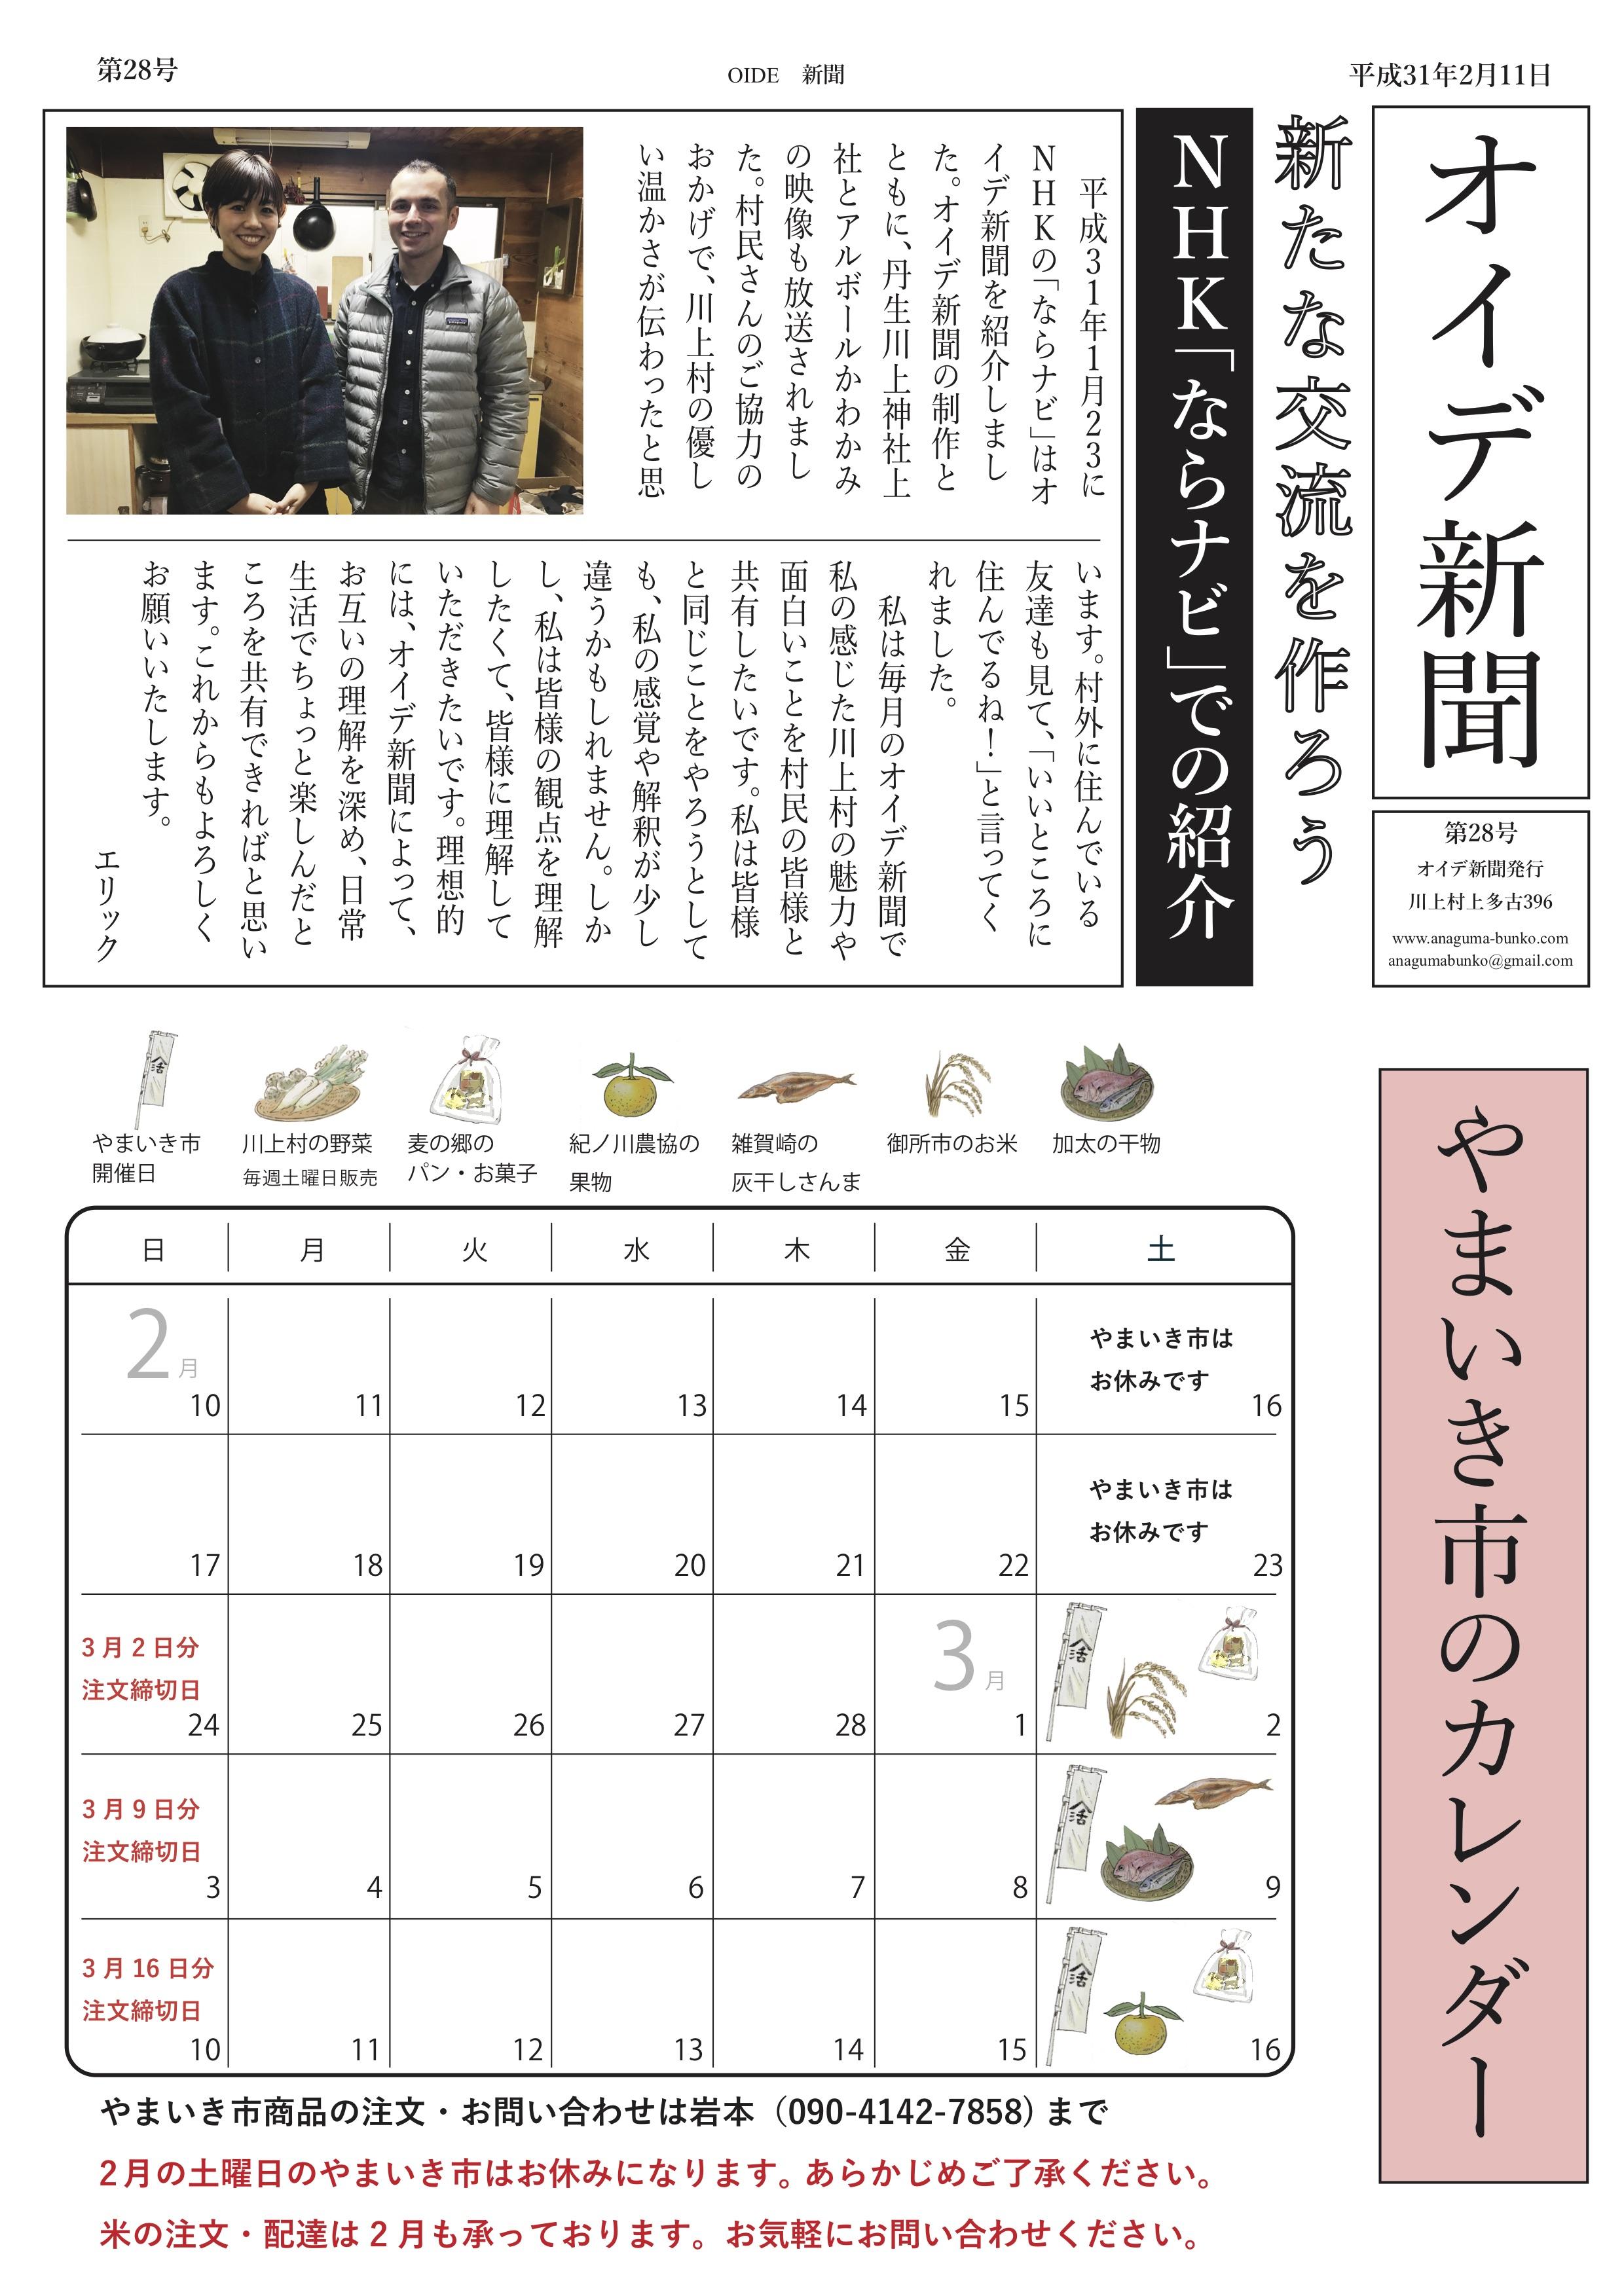 oide新聞31年2月号表.jpg